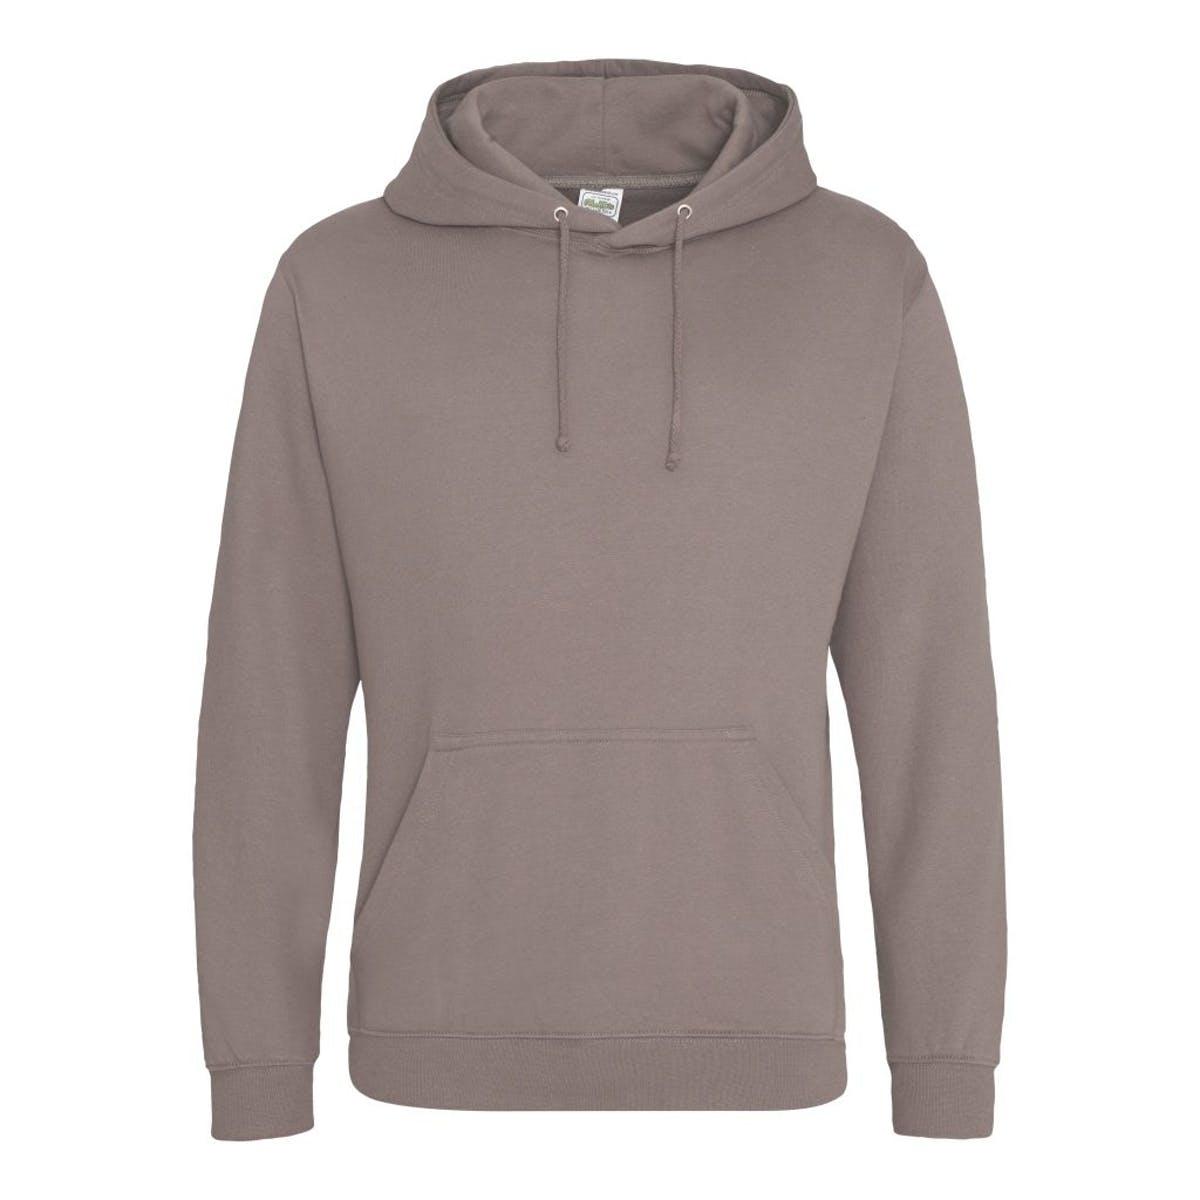 mocha college hoodies